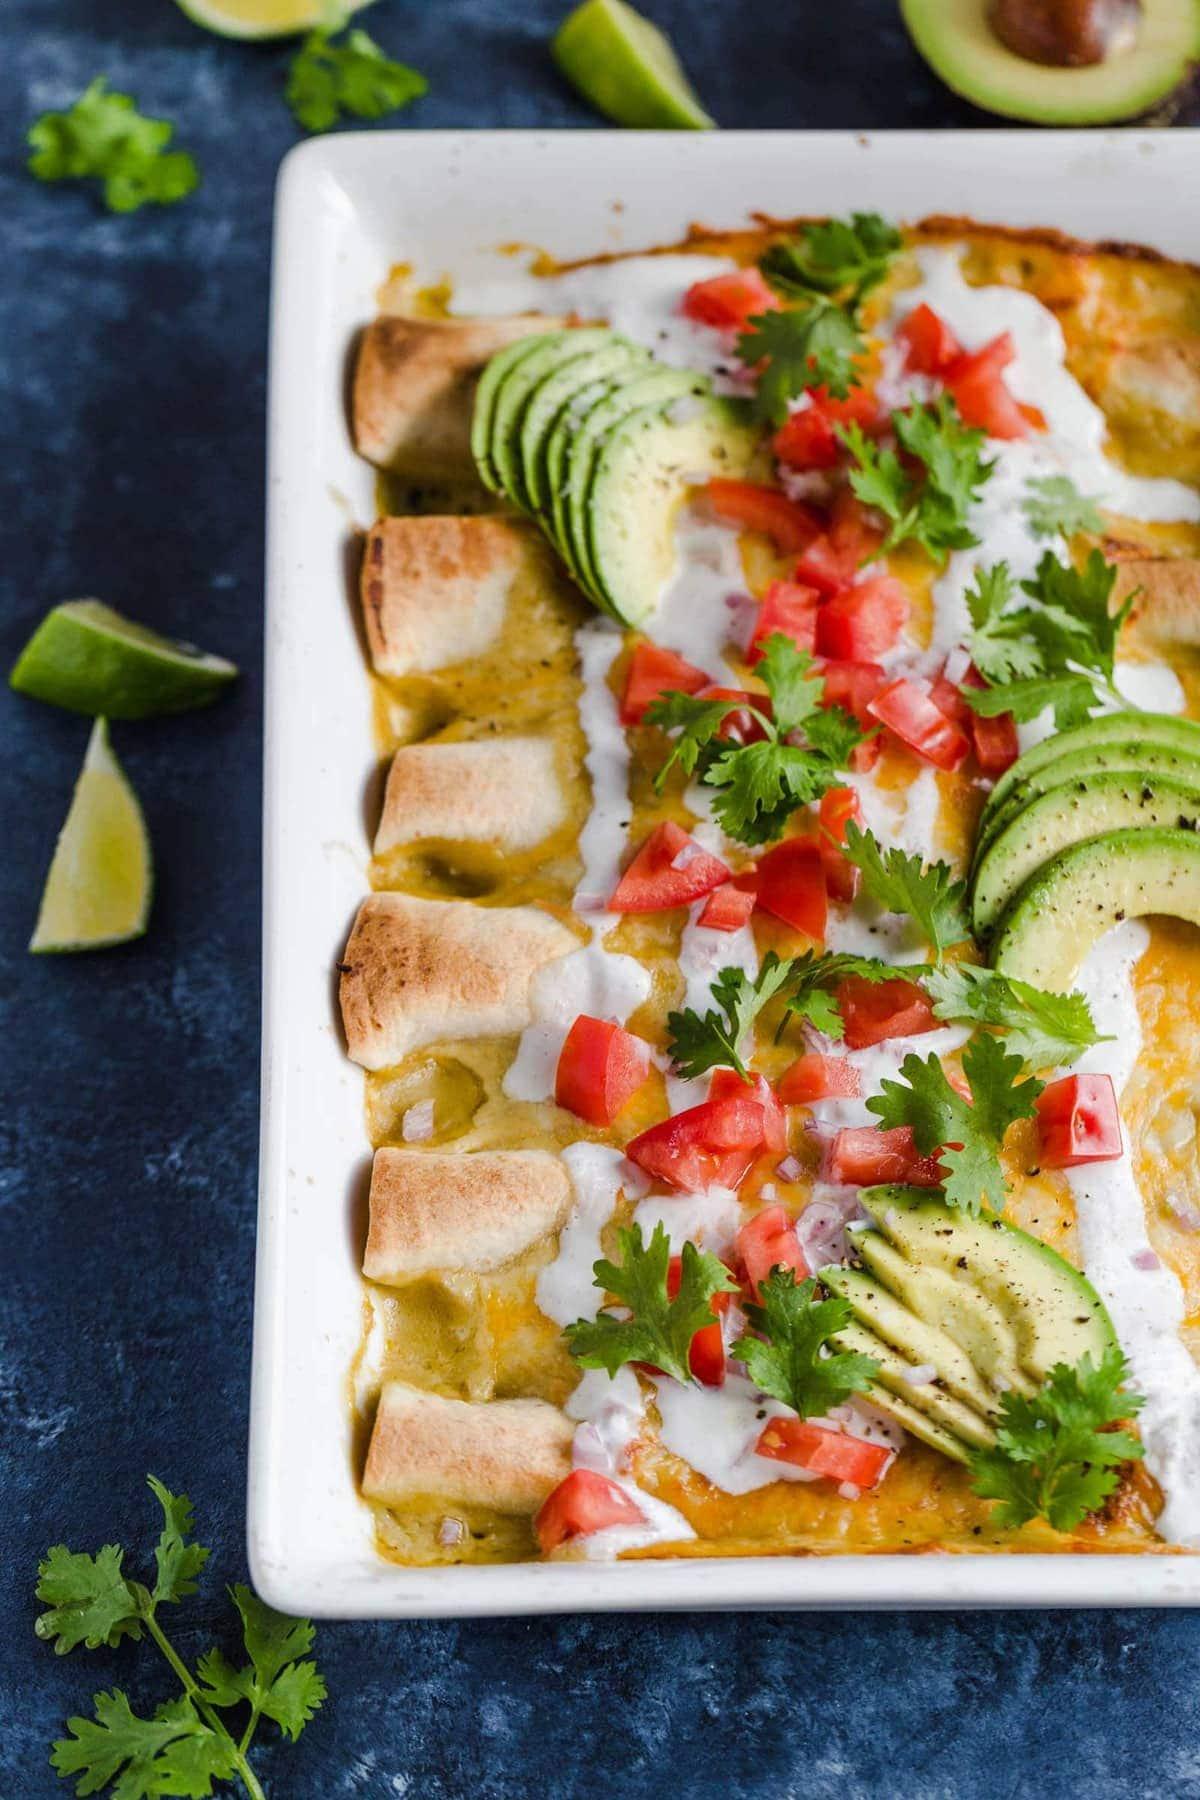 Honey Lime Chicken Enchiladas topped with tomatoes, avocado, sour cream, and cilantro